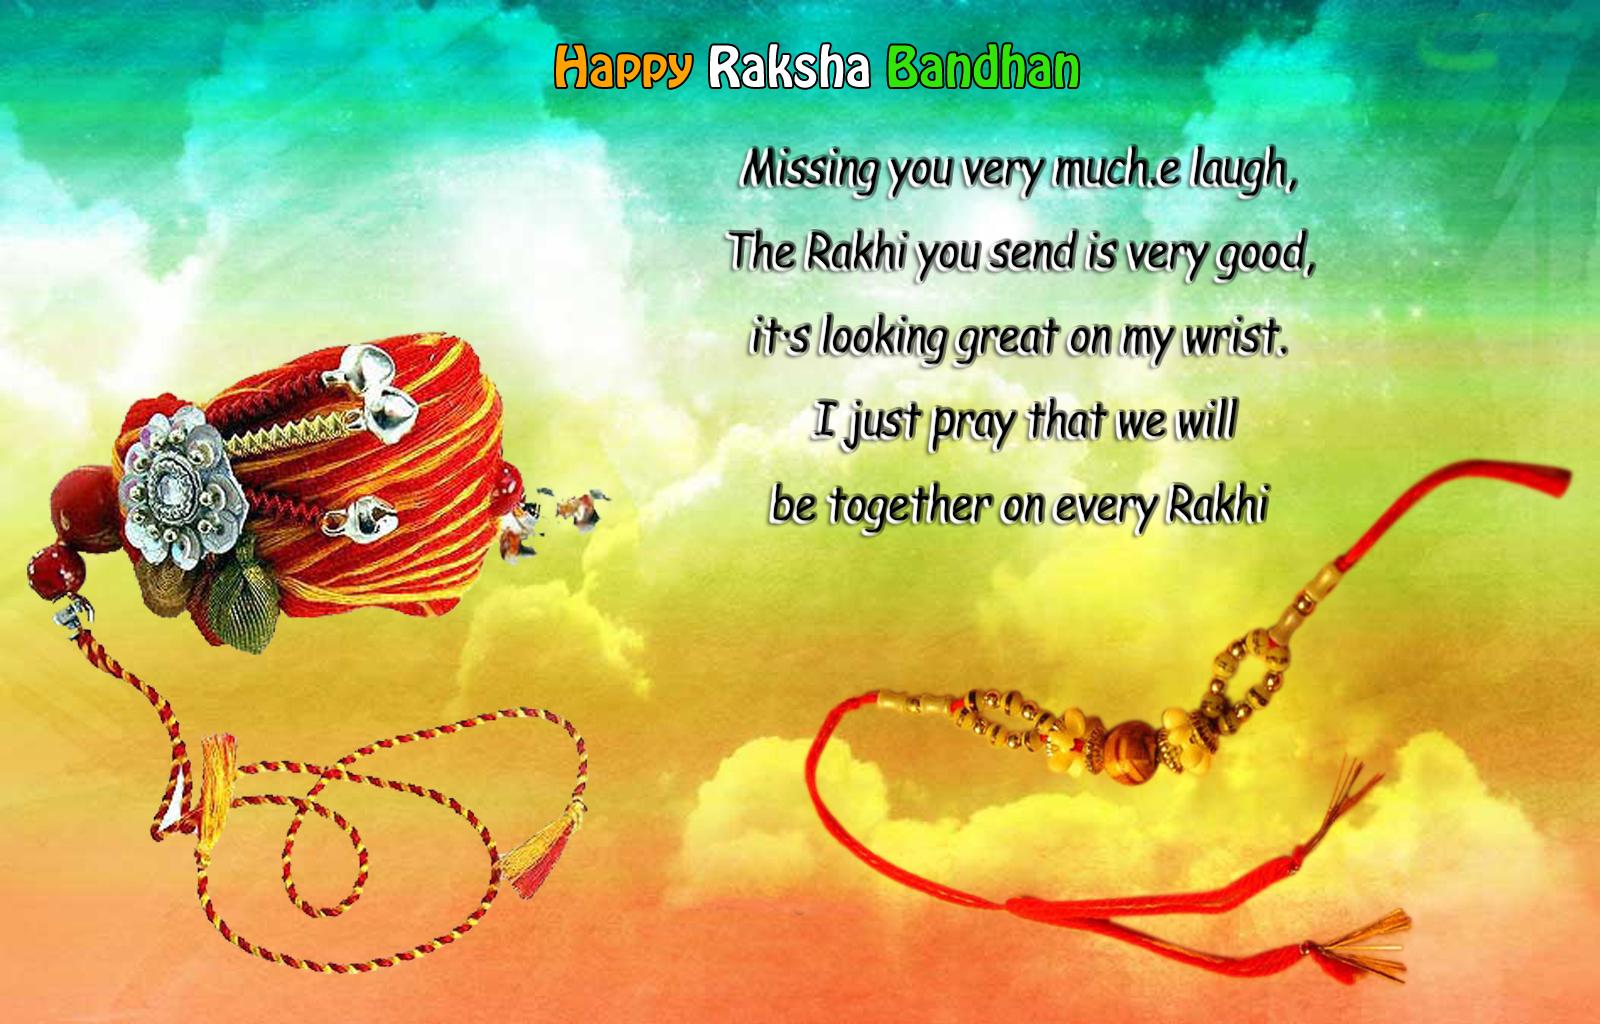 Rakhi Festival The Loving Bond Between Brother Sisters Rakhi 2013